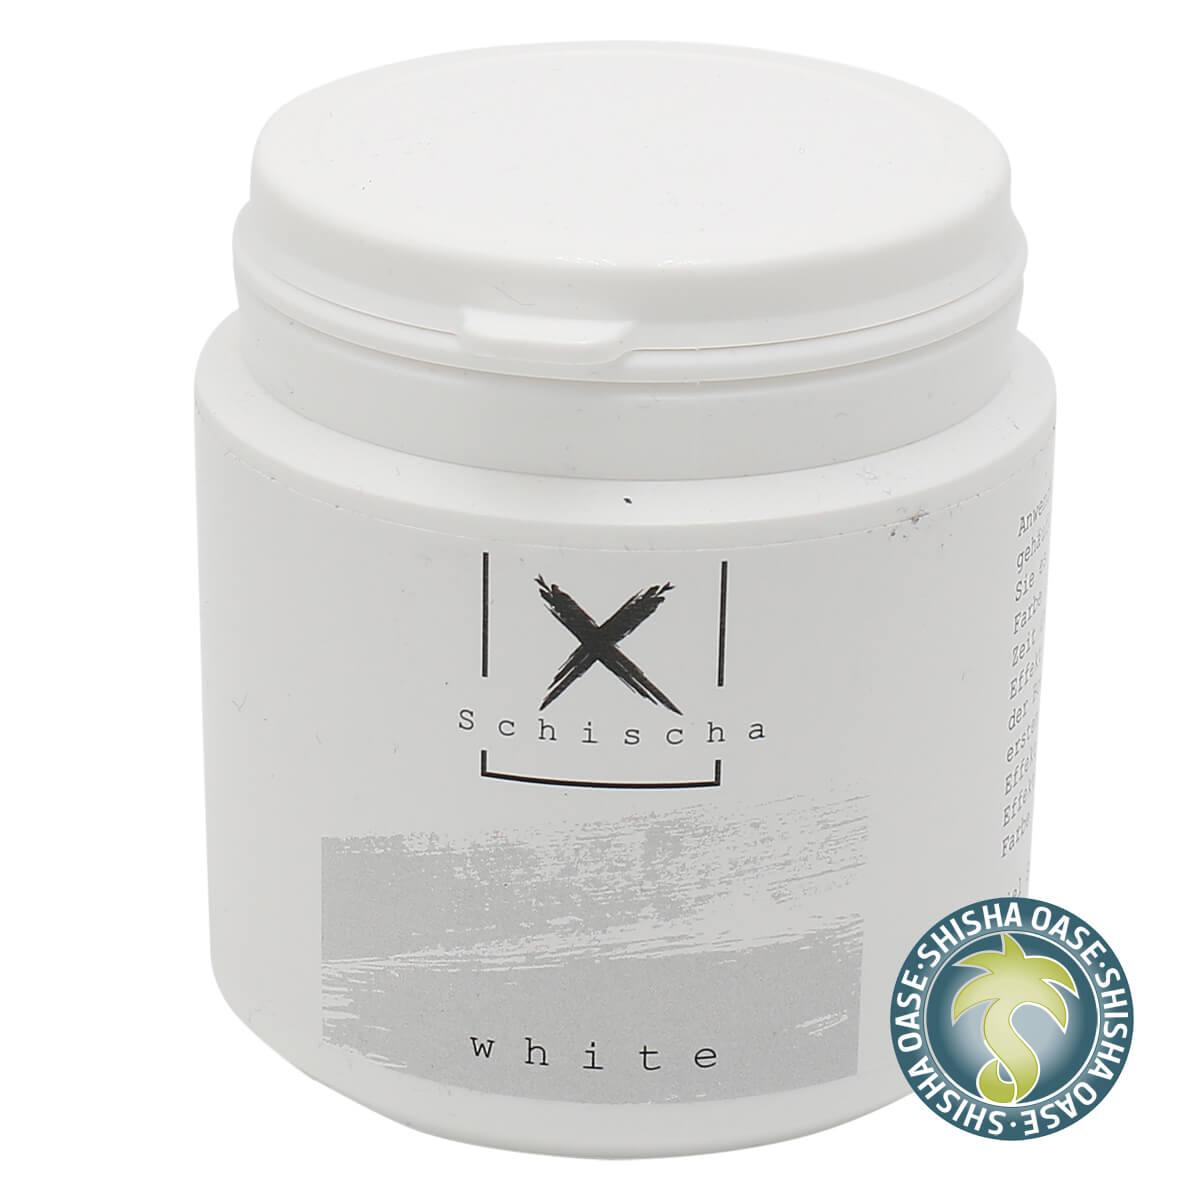 Xschischa Sparkles 50g | White Sparkle